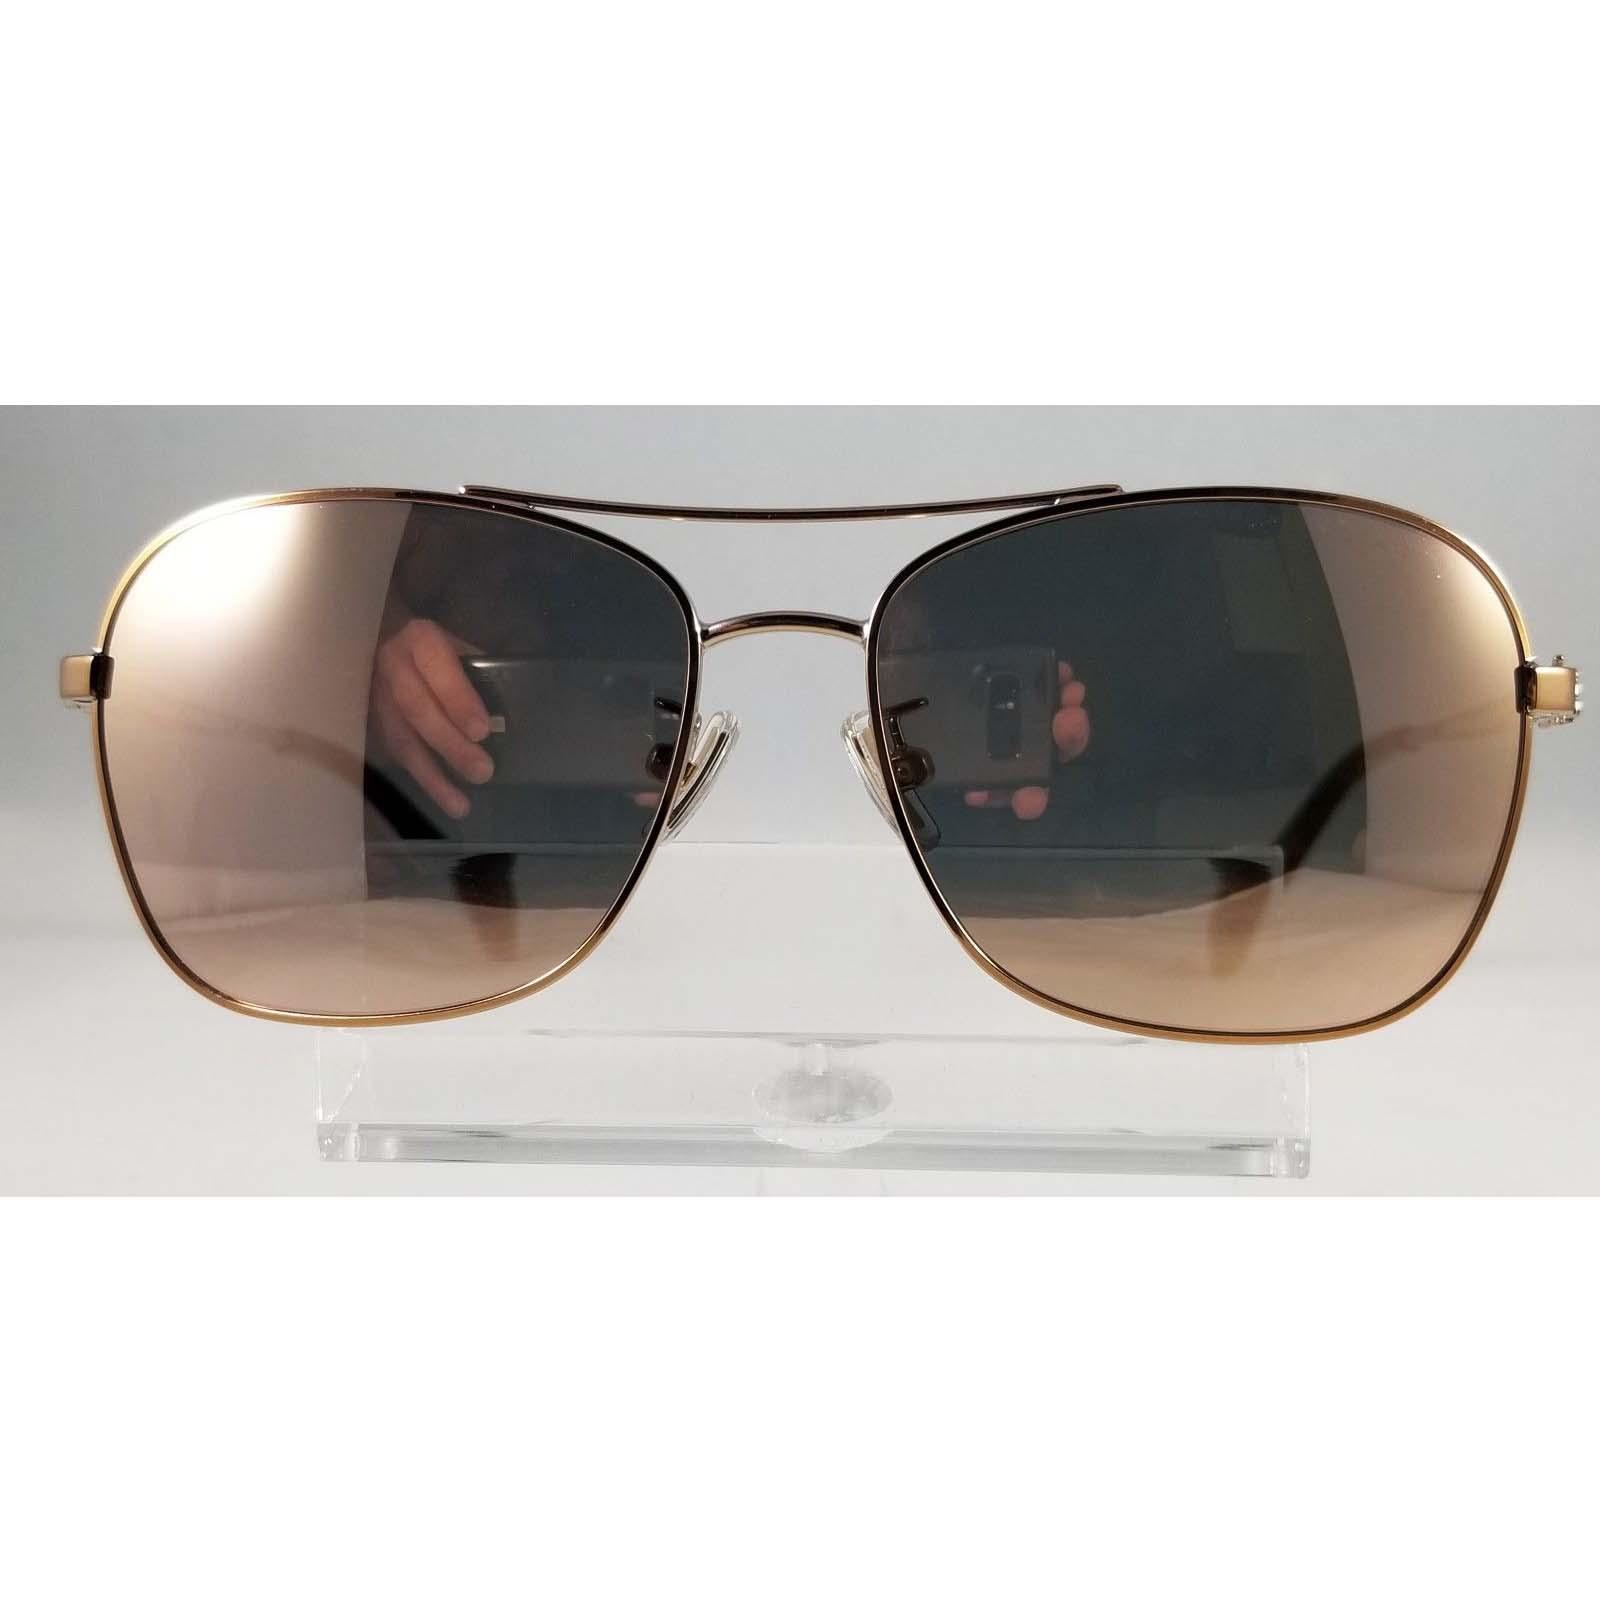 b0f7d0904 coupon code for coach rose gold sunglasses 0fd3f 21fa6